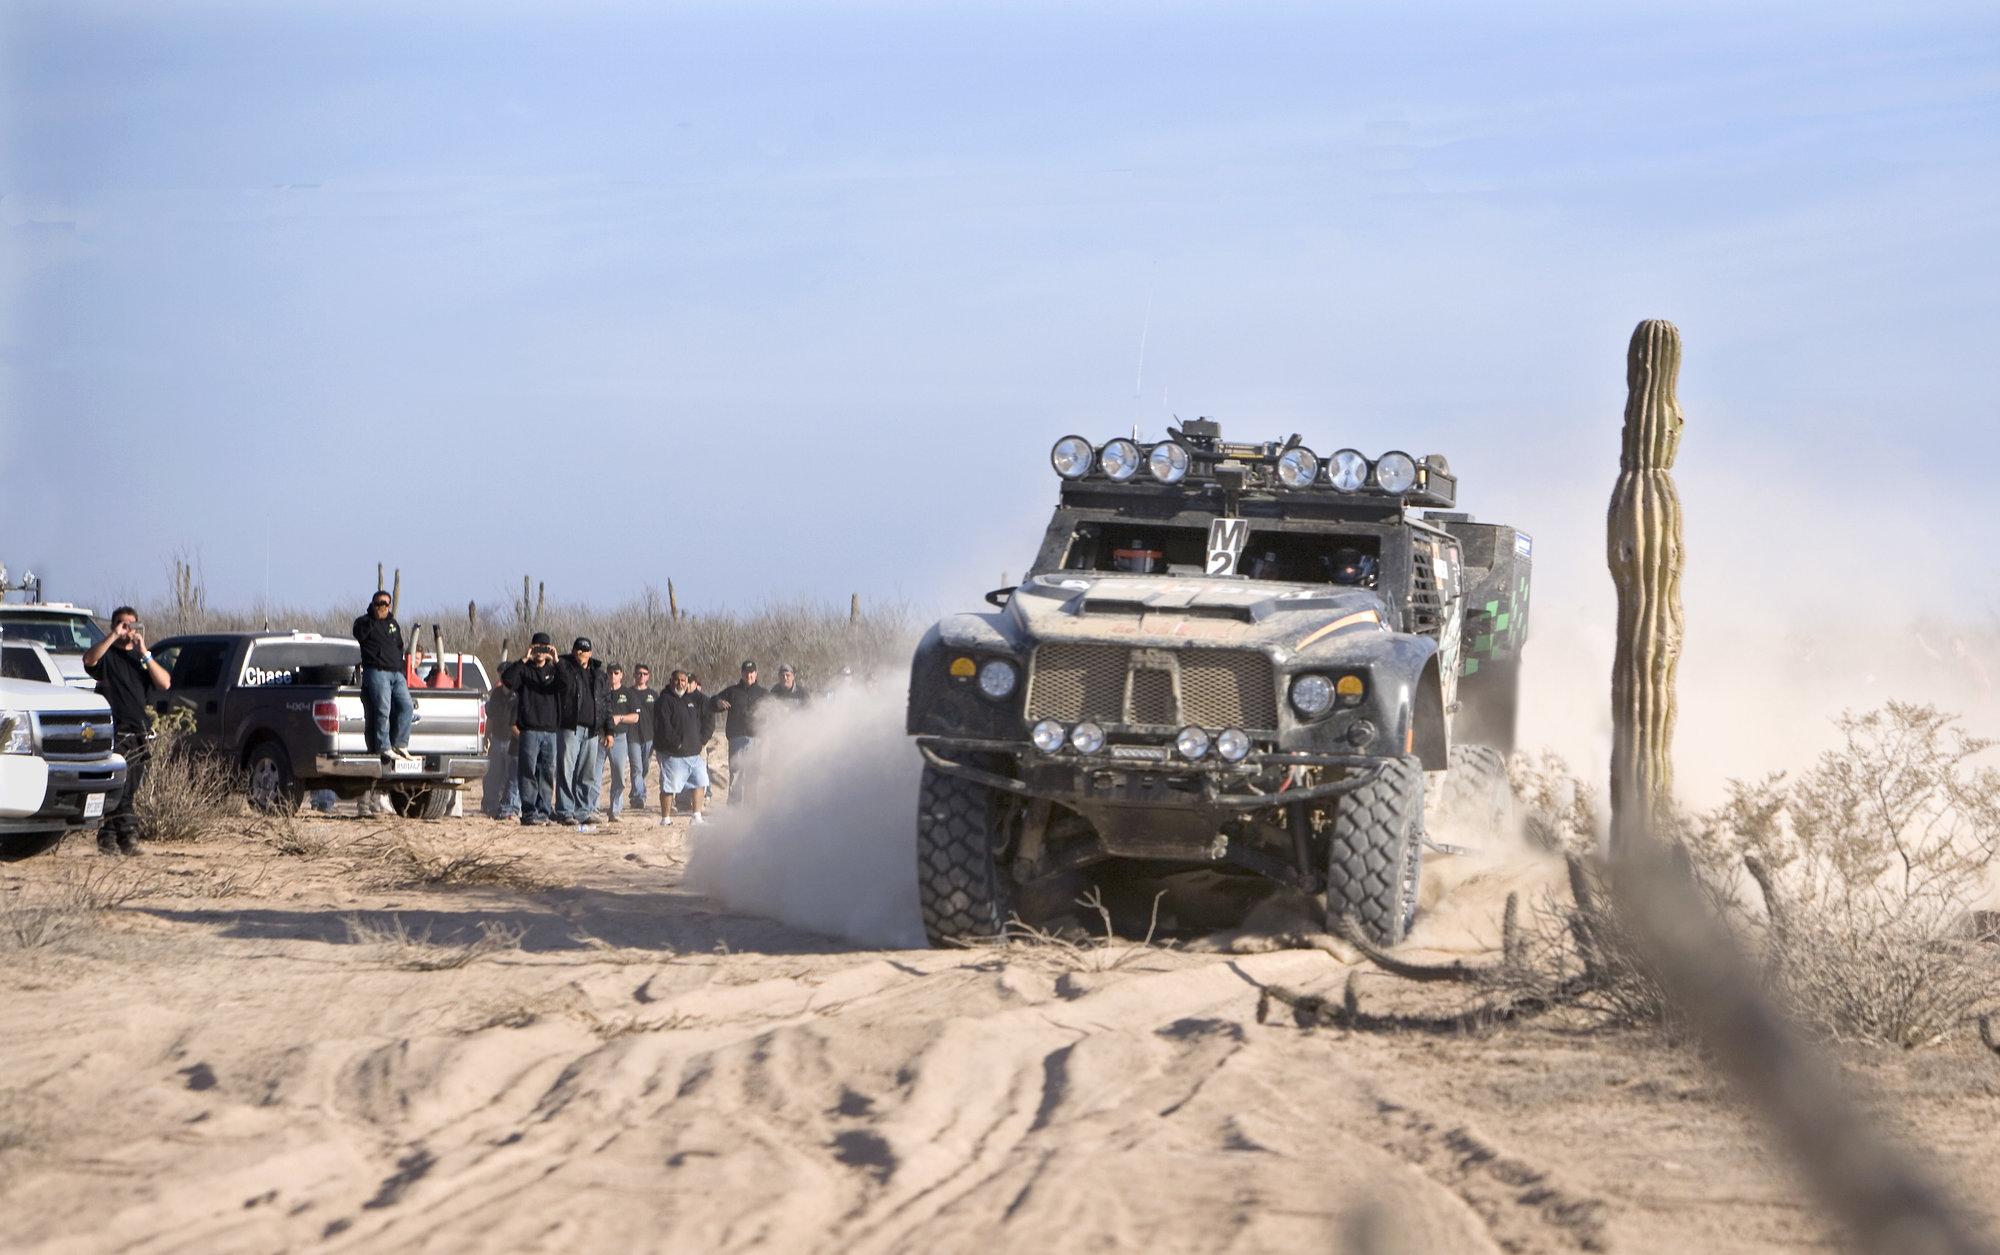 Oshkosh Extreme Racing - LCV on the Baja 08.jpg